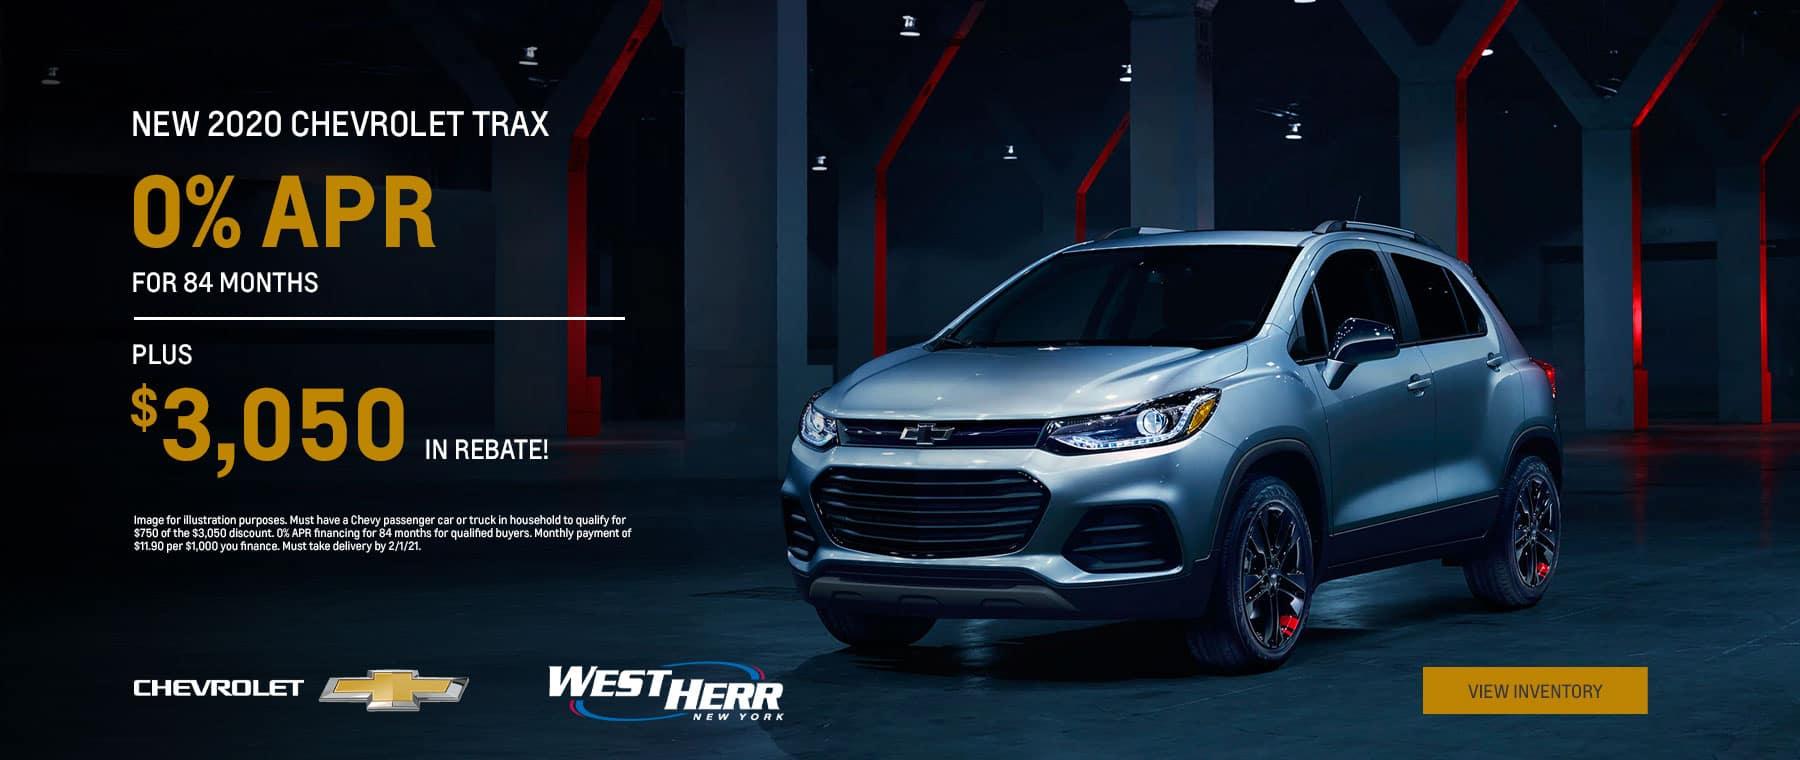 2020 Chevrolet Trax - Jan 2021